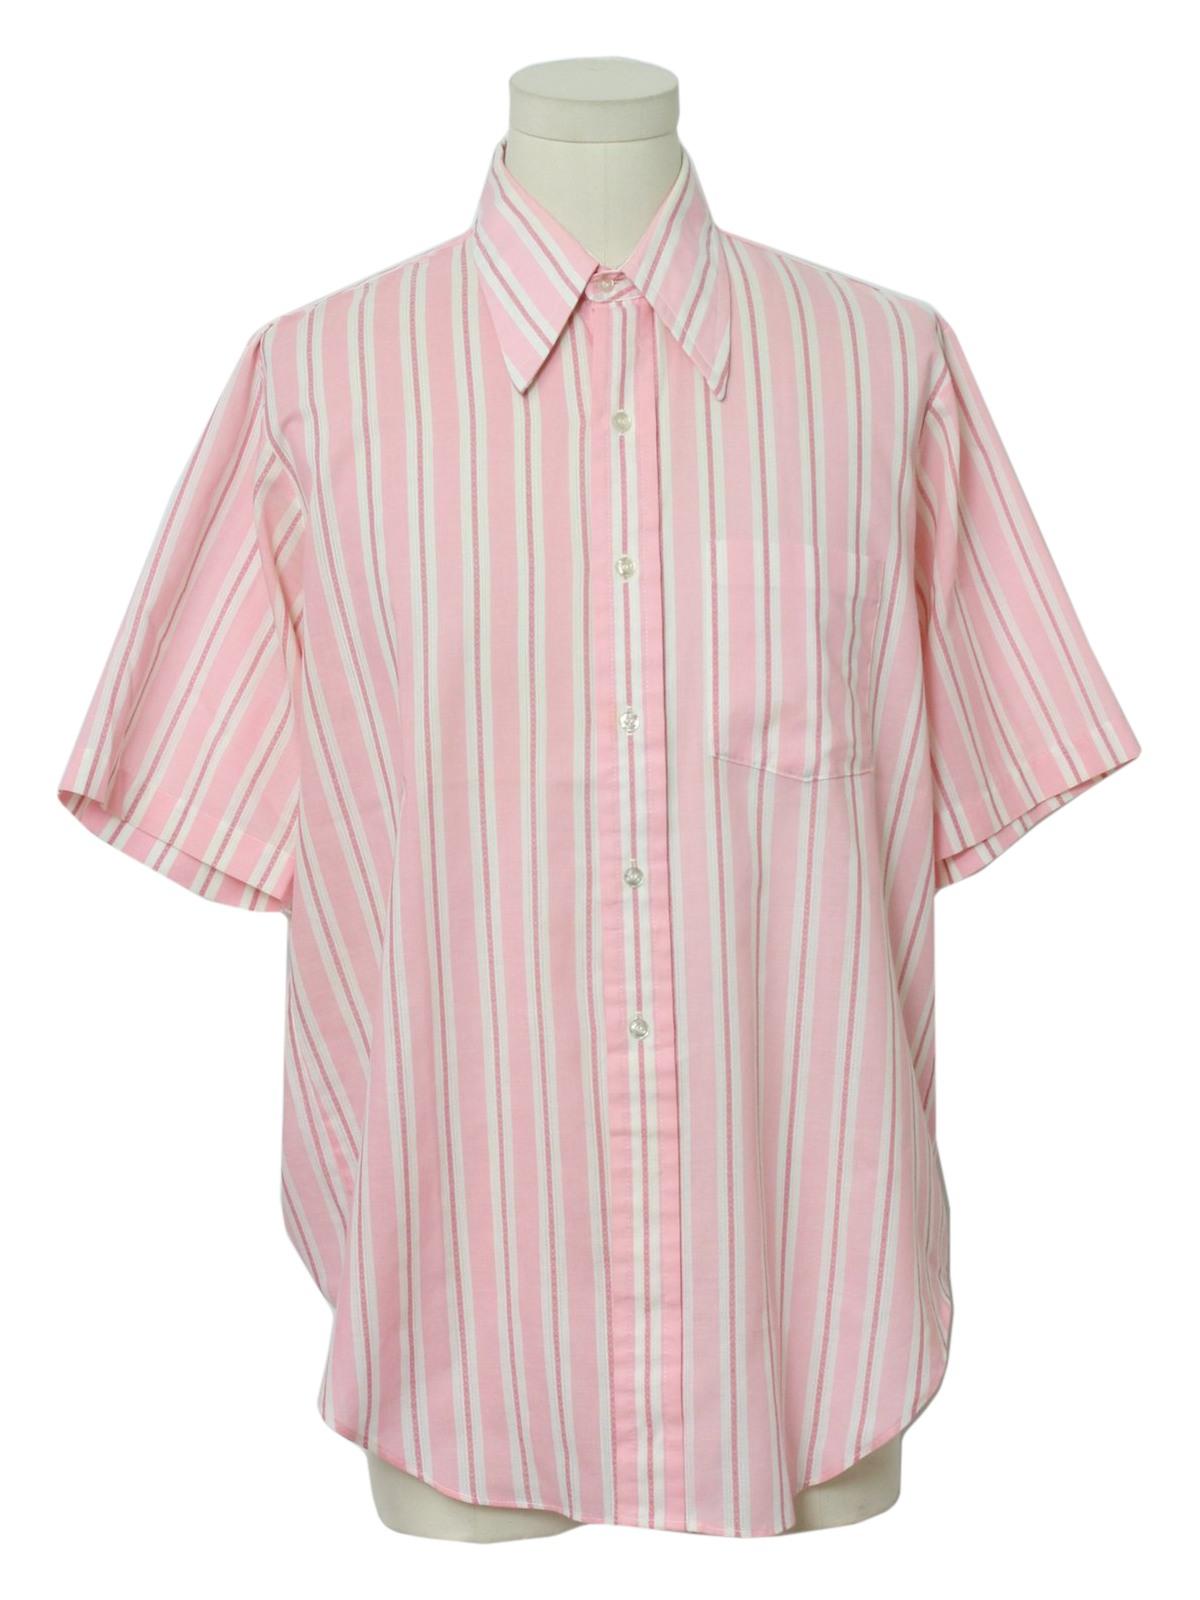 70s Men's Short-Sleeve Striped Shirt TohugHXO